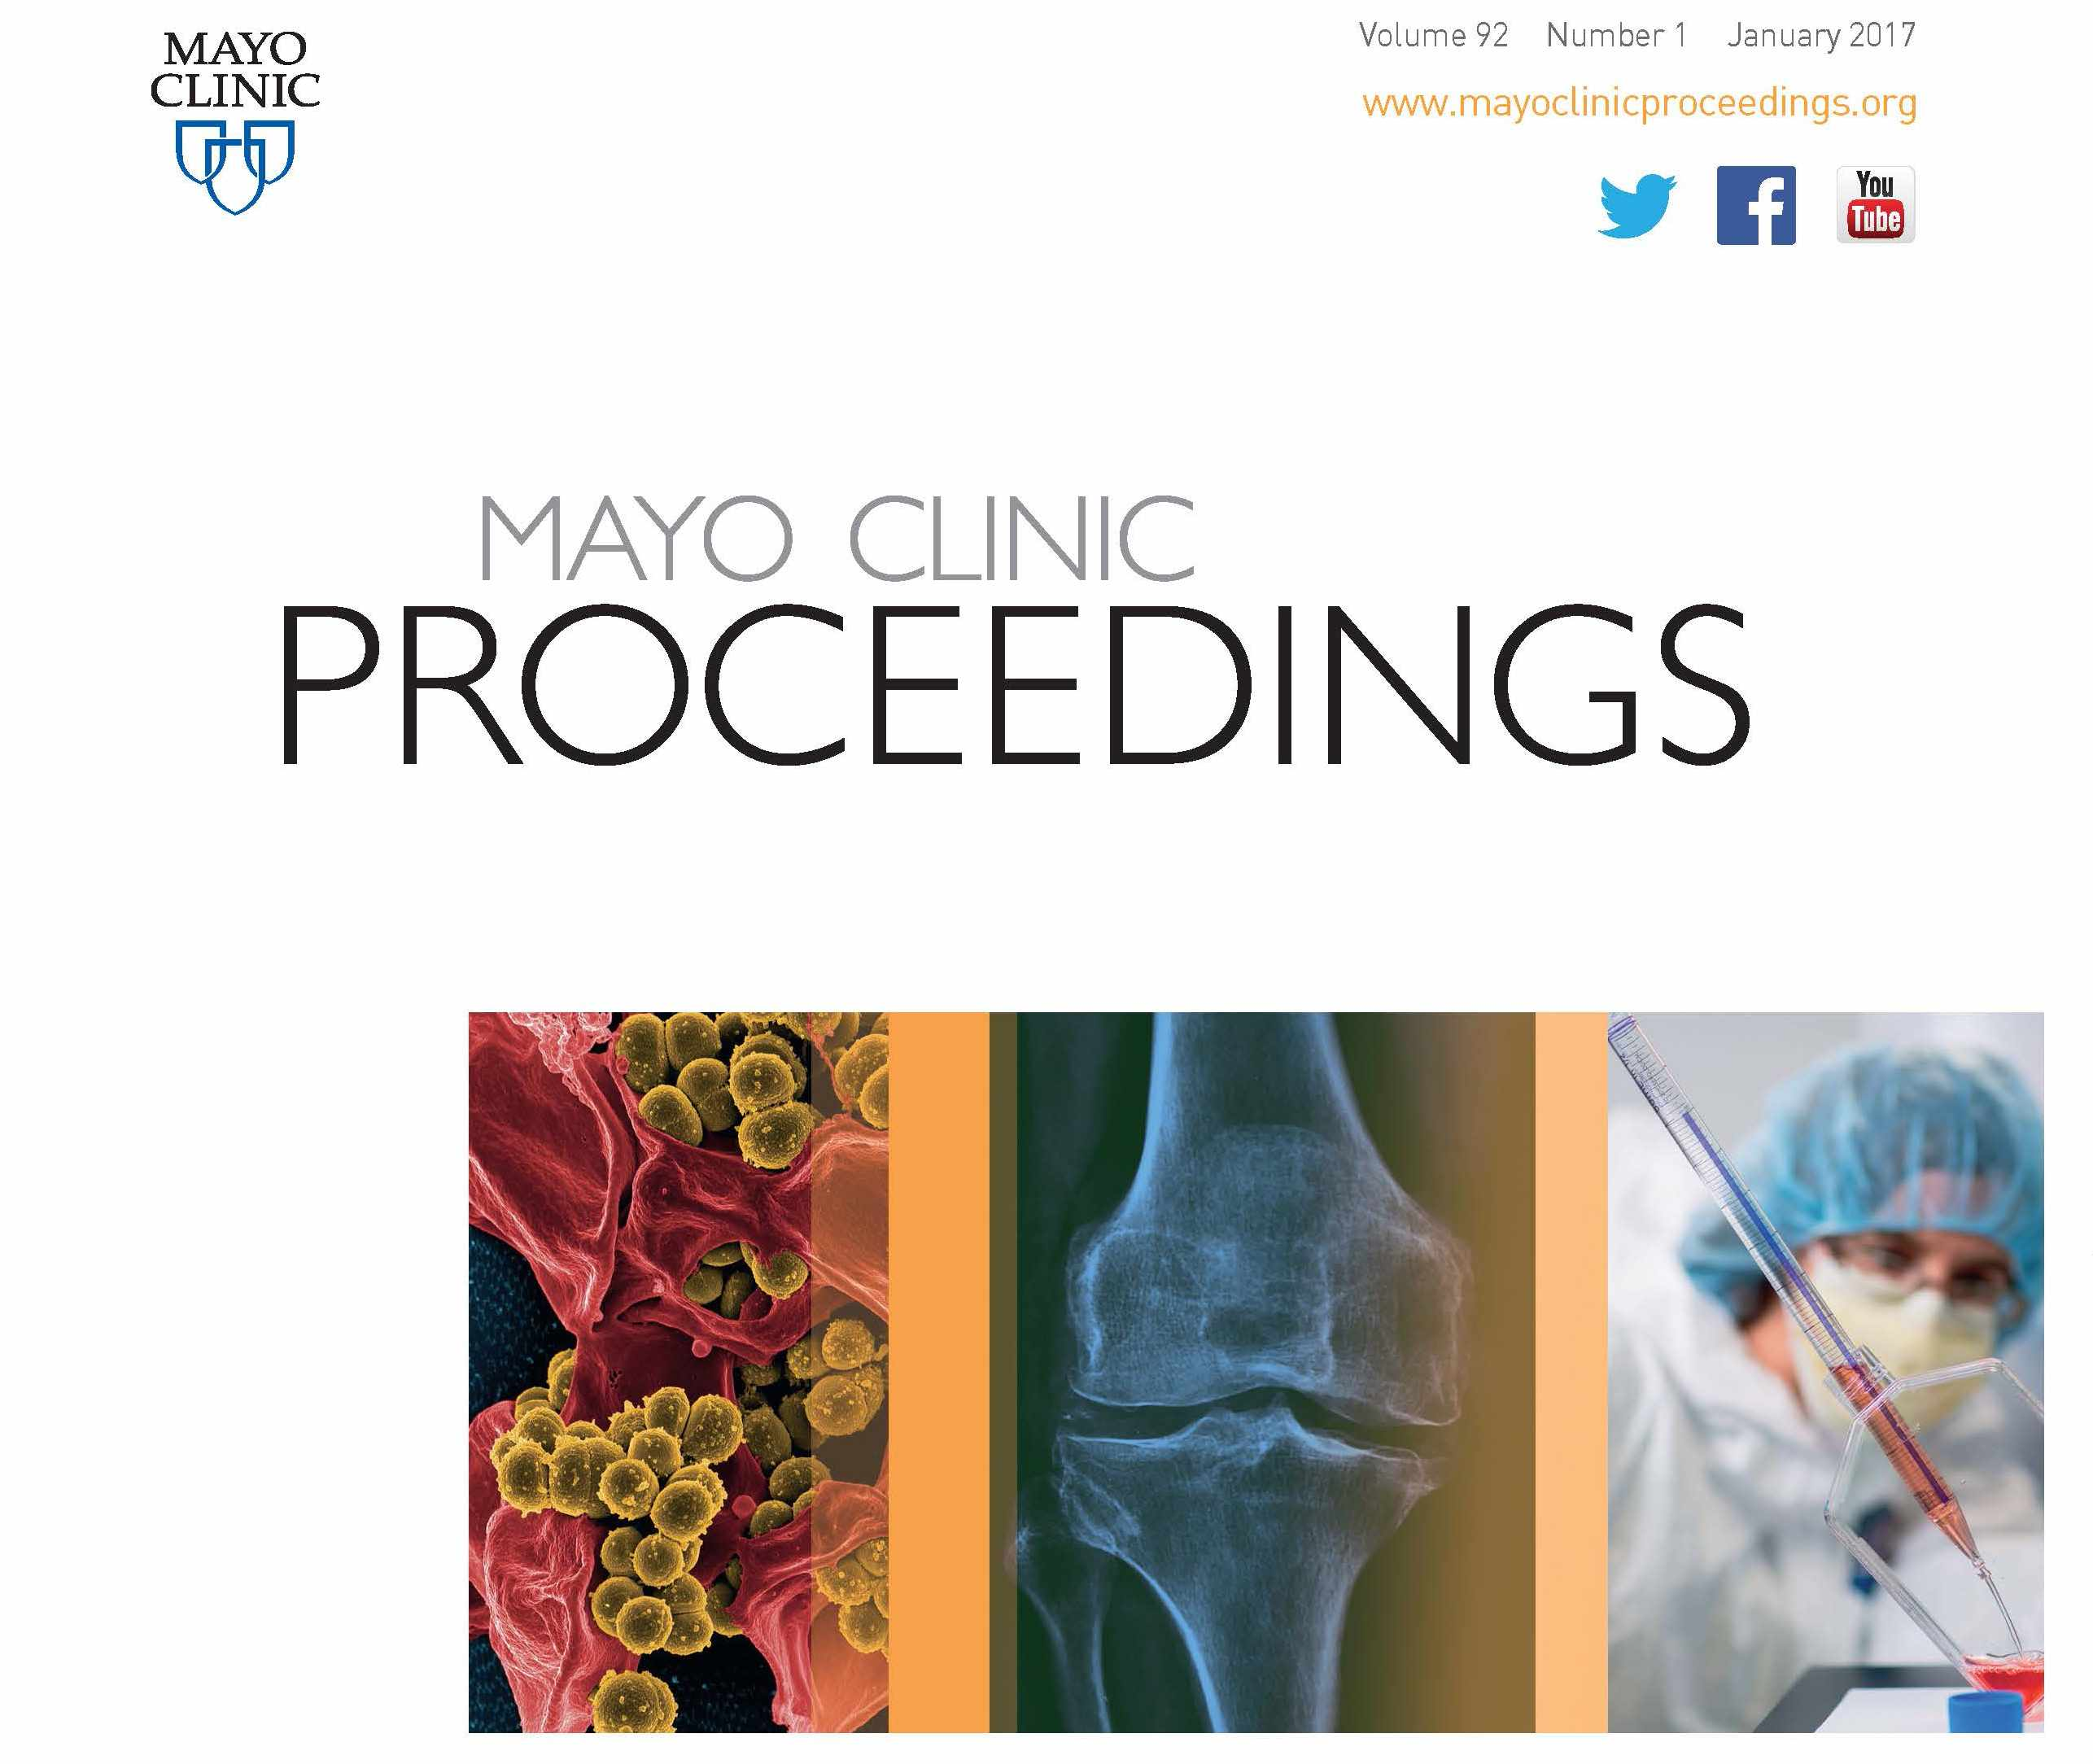 Mayo Clinic Proceedings cover